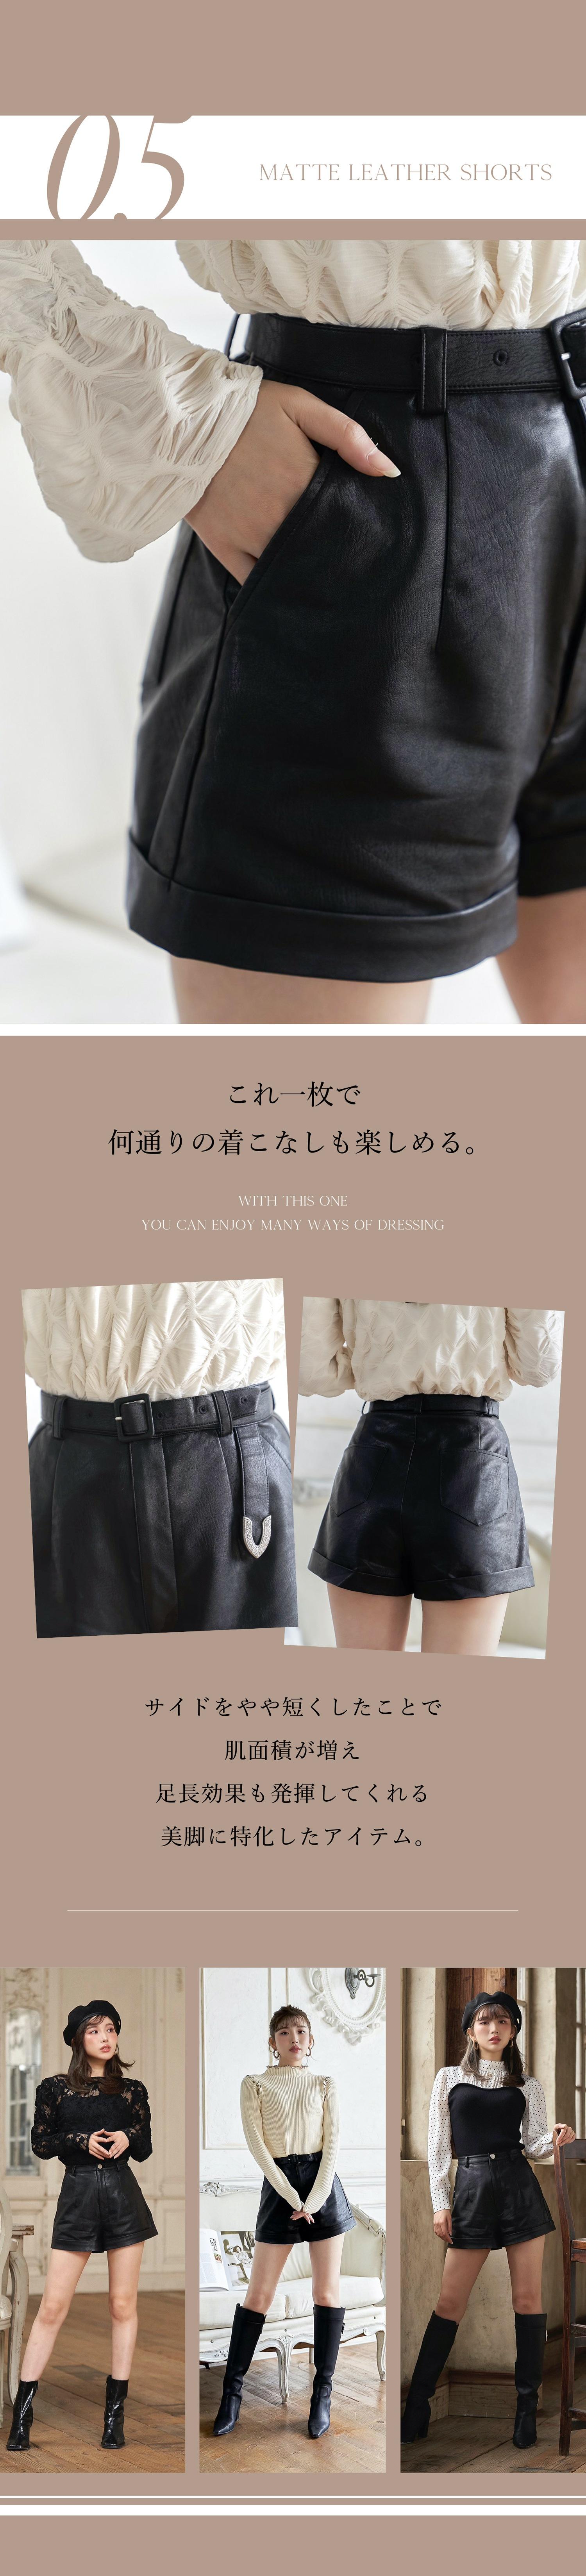 20AW ブルジョワルック新作特集5